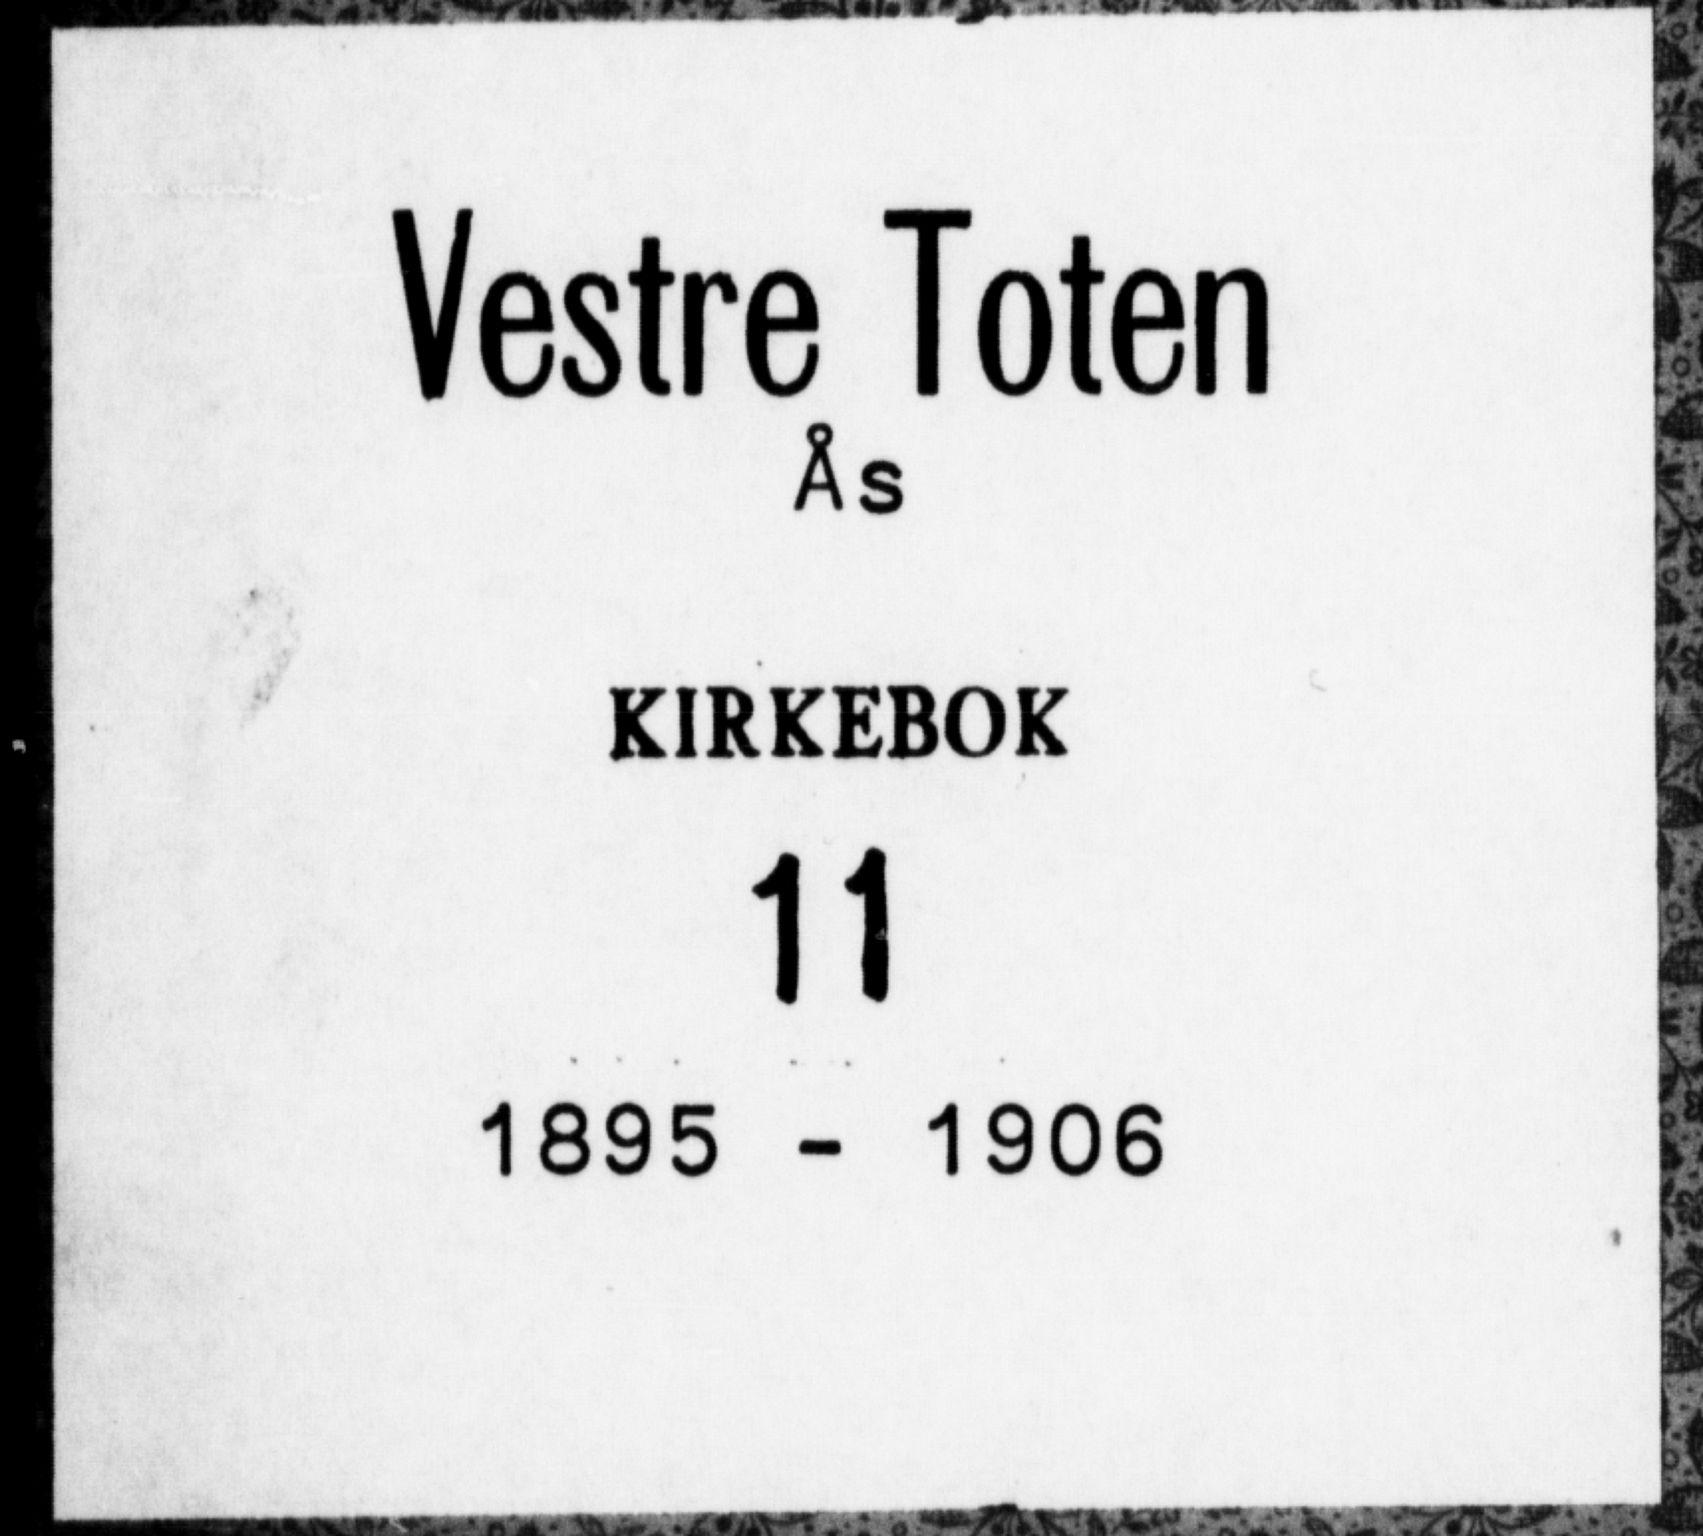 SAH, Vestre Toten prestekontor, Ministerialbok nr. 11, 1895-1906